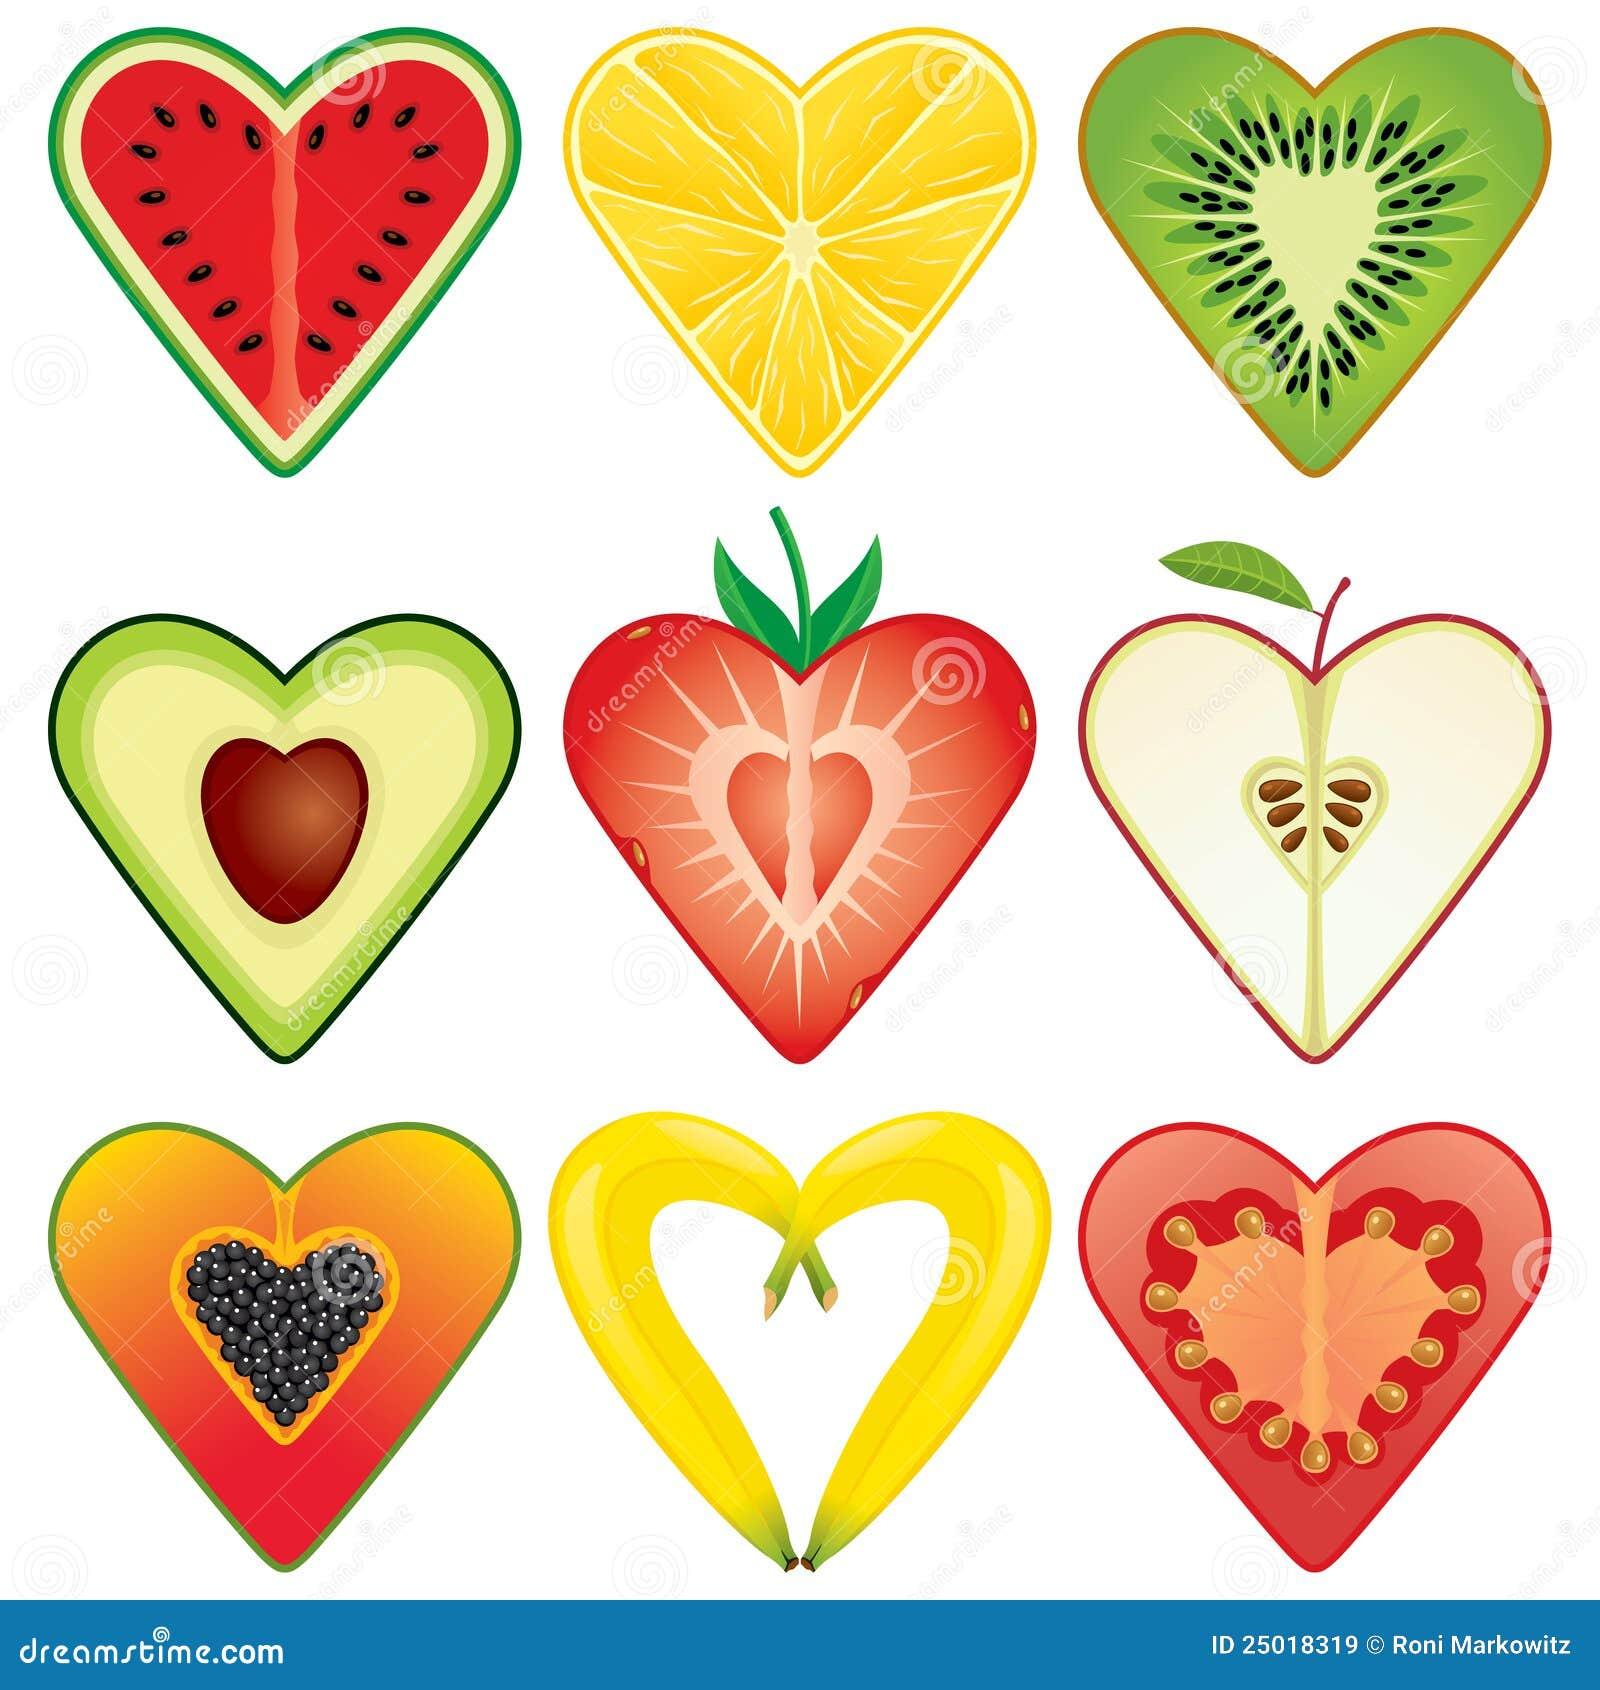 Healthy Heart Shaped Food